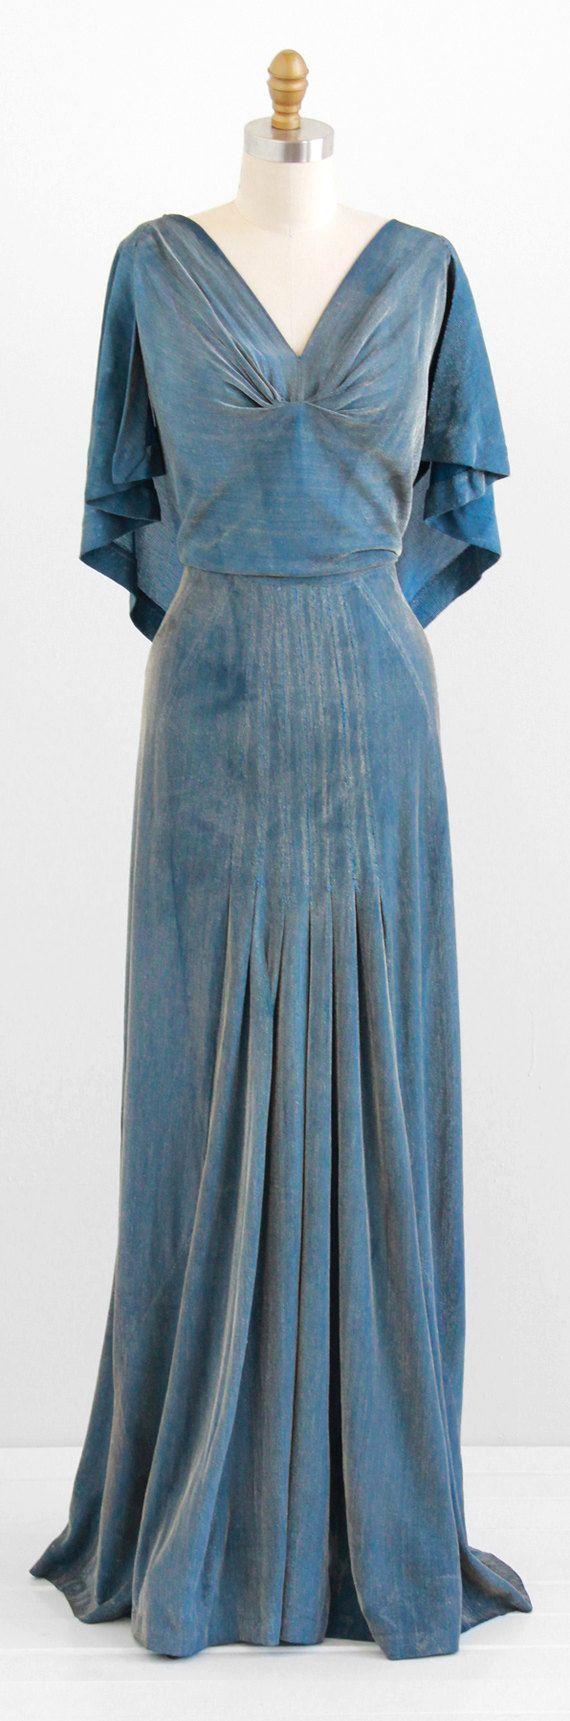 silver and blue art deco - Google Search